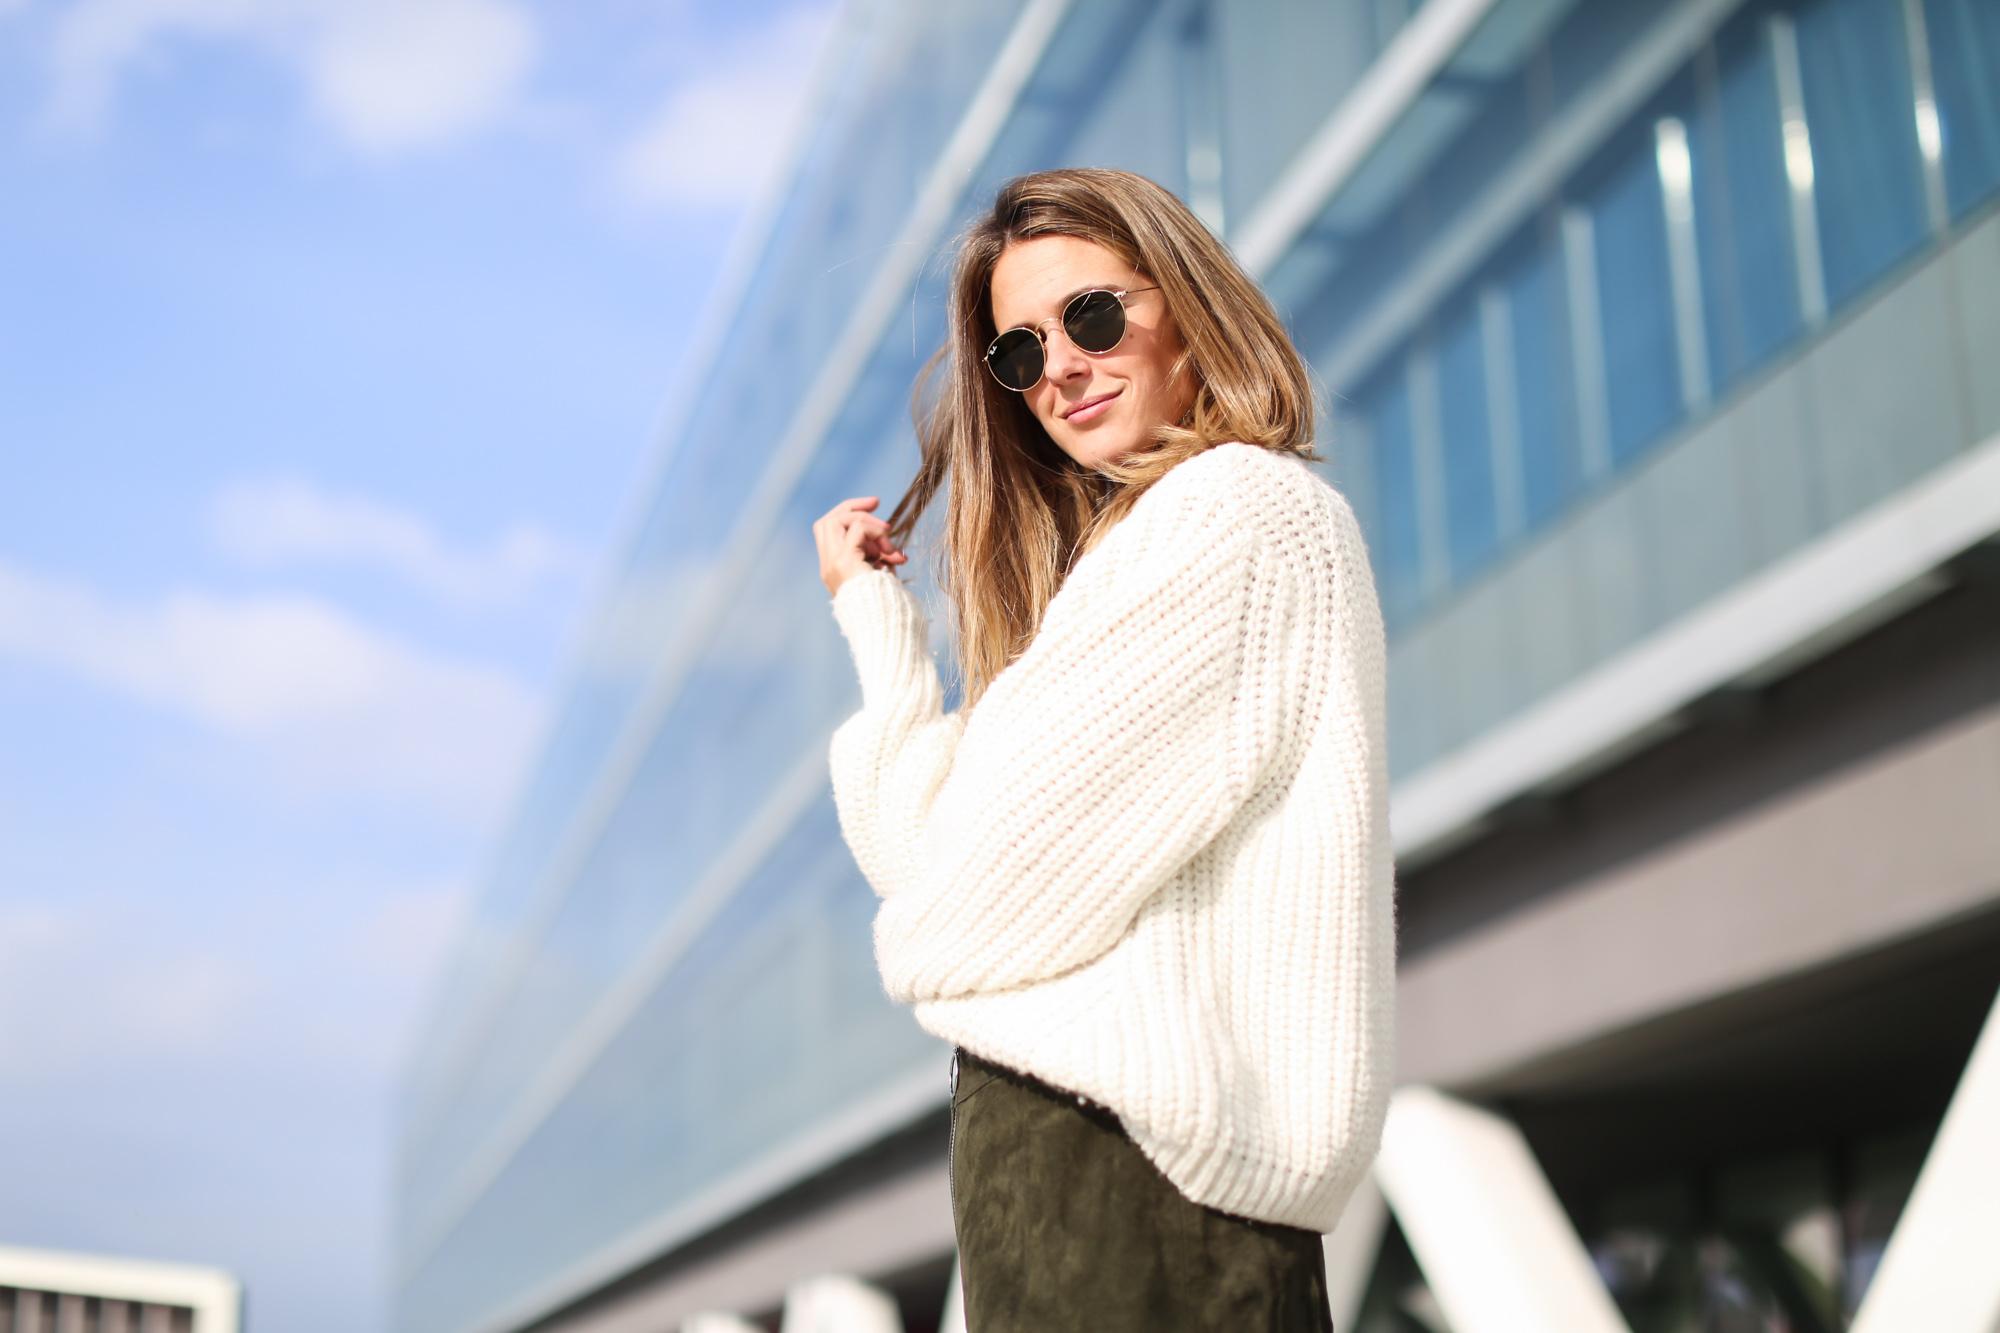 Clochet_streetstyle_fashionblogger_asosfauxfurcoat_minifaldaantezara_botinespieldorados-7